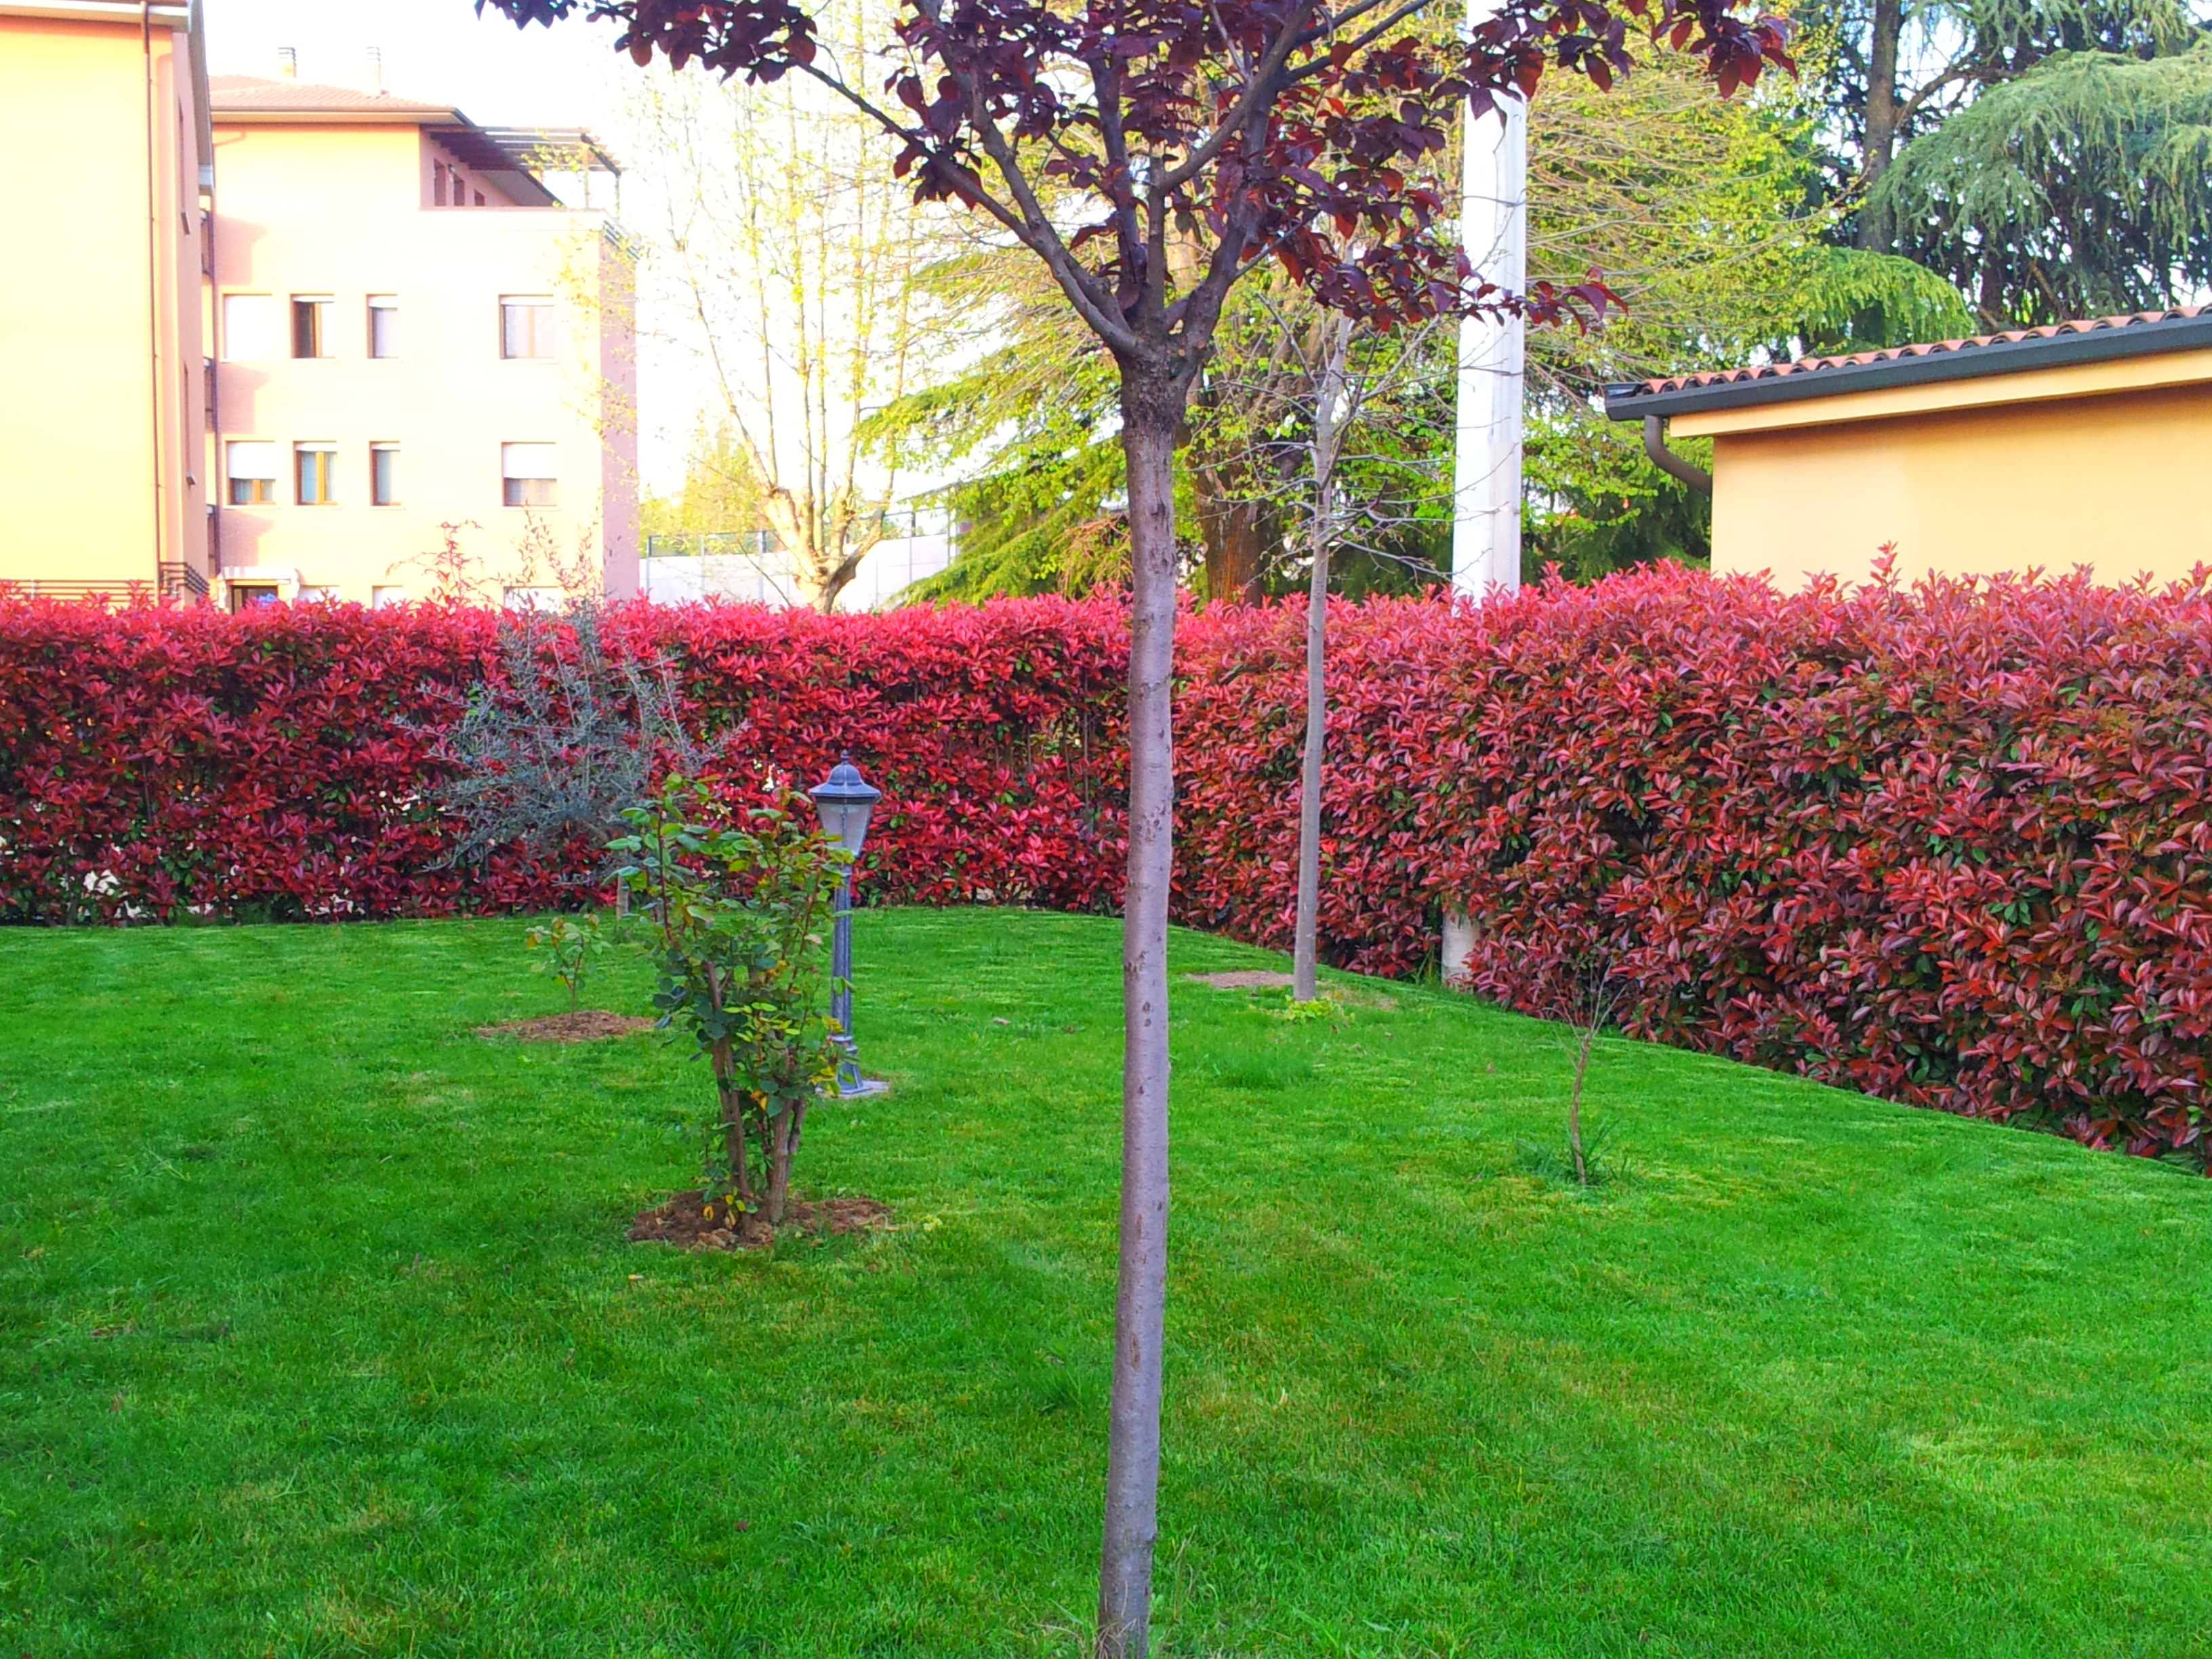 Photinia pianta per siepi da giardino - Alberi frutto giardino ...